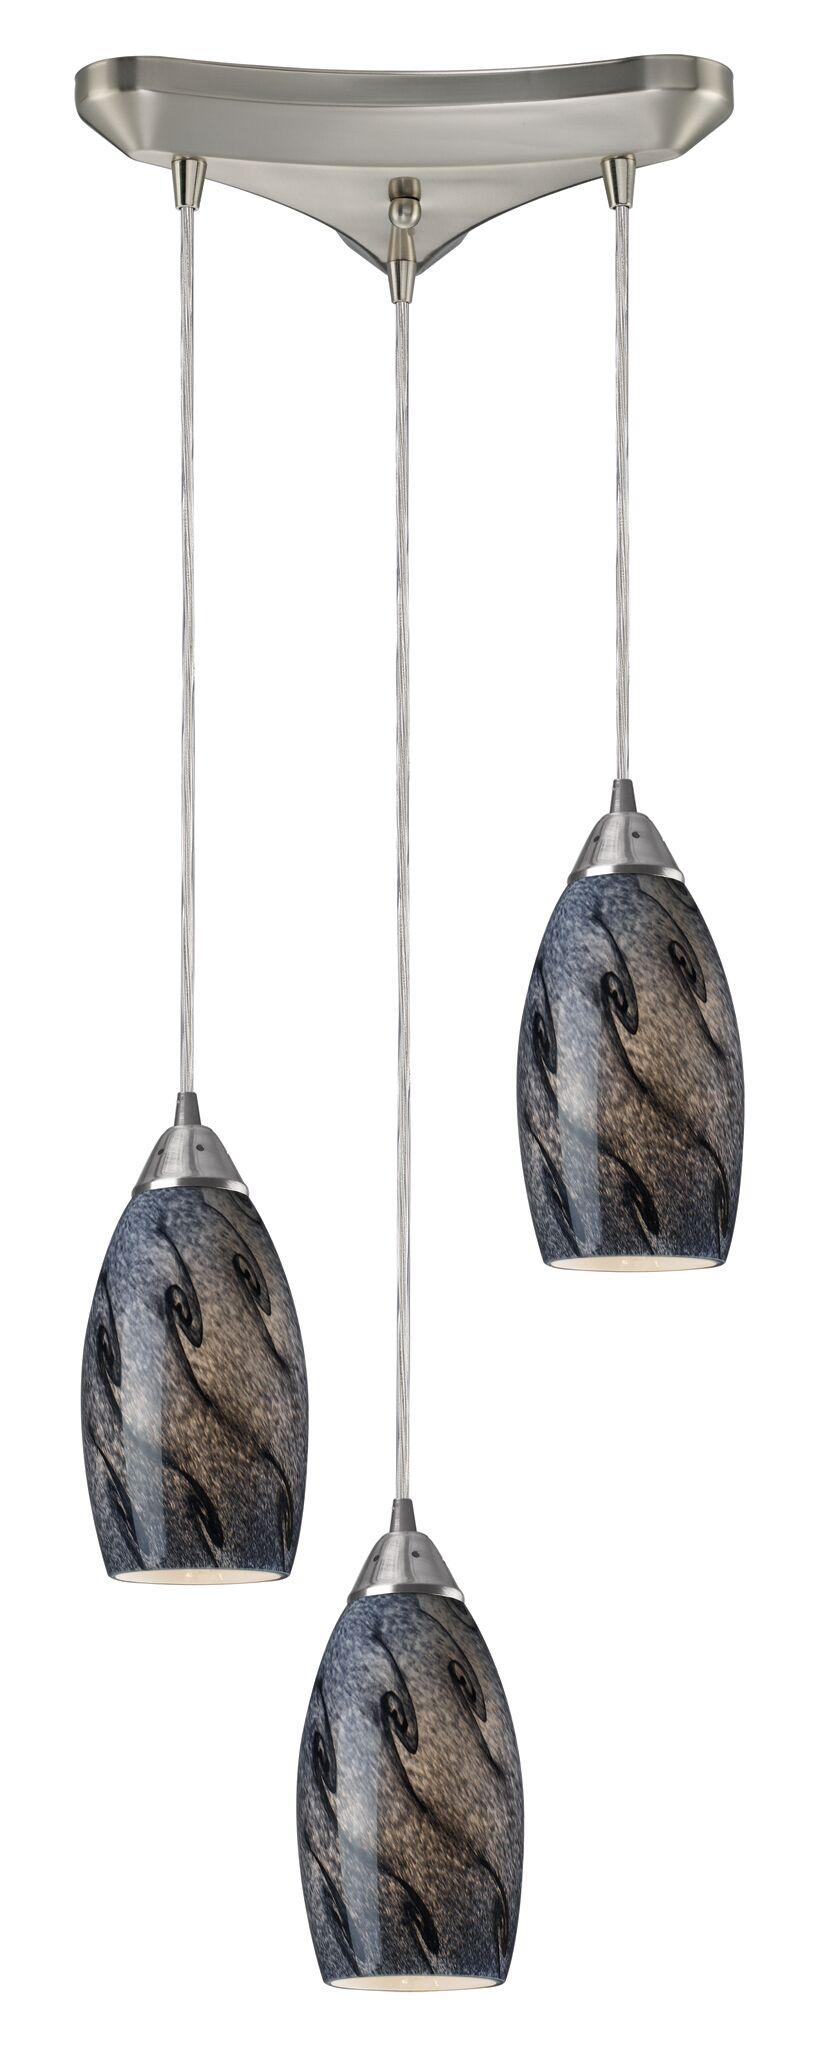 Panek 3-Light Pendant Glass Shade: Smoke and Satin Nickel